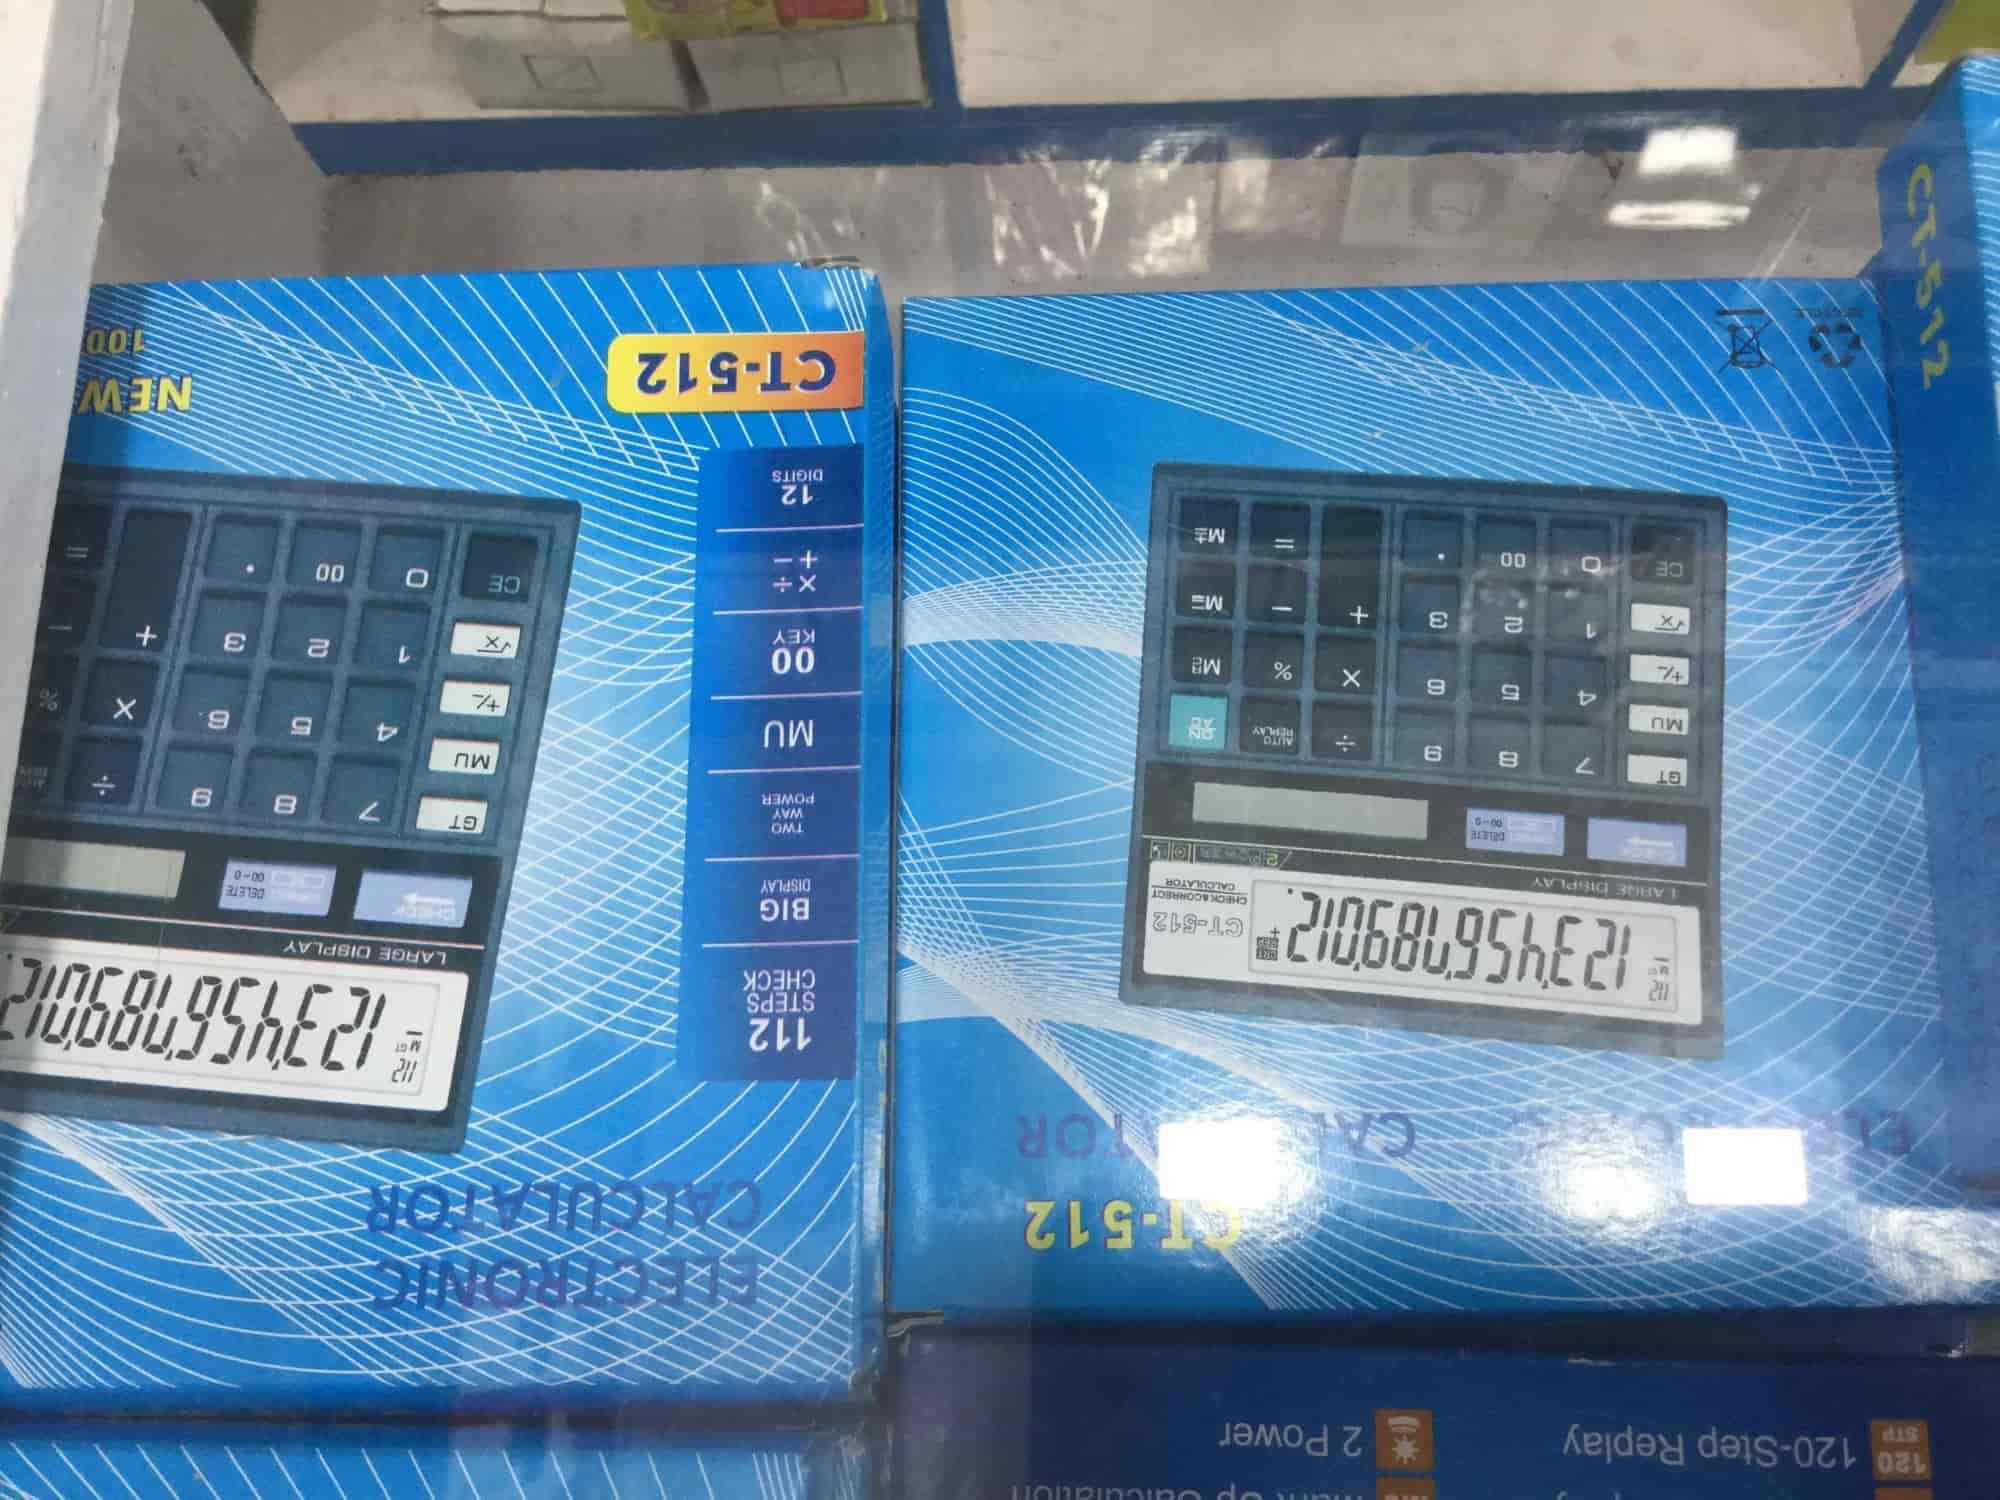 Binu Electronics Pallimukku Electronic Goods Showrooms In Fish Caller Circuit Ernakulam Justdial